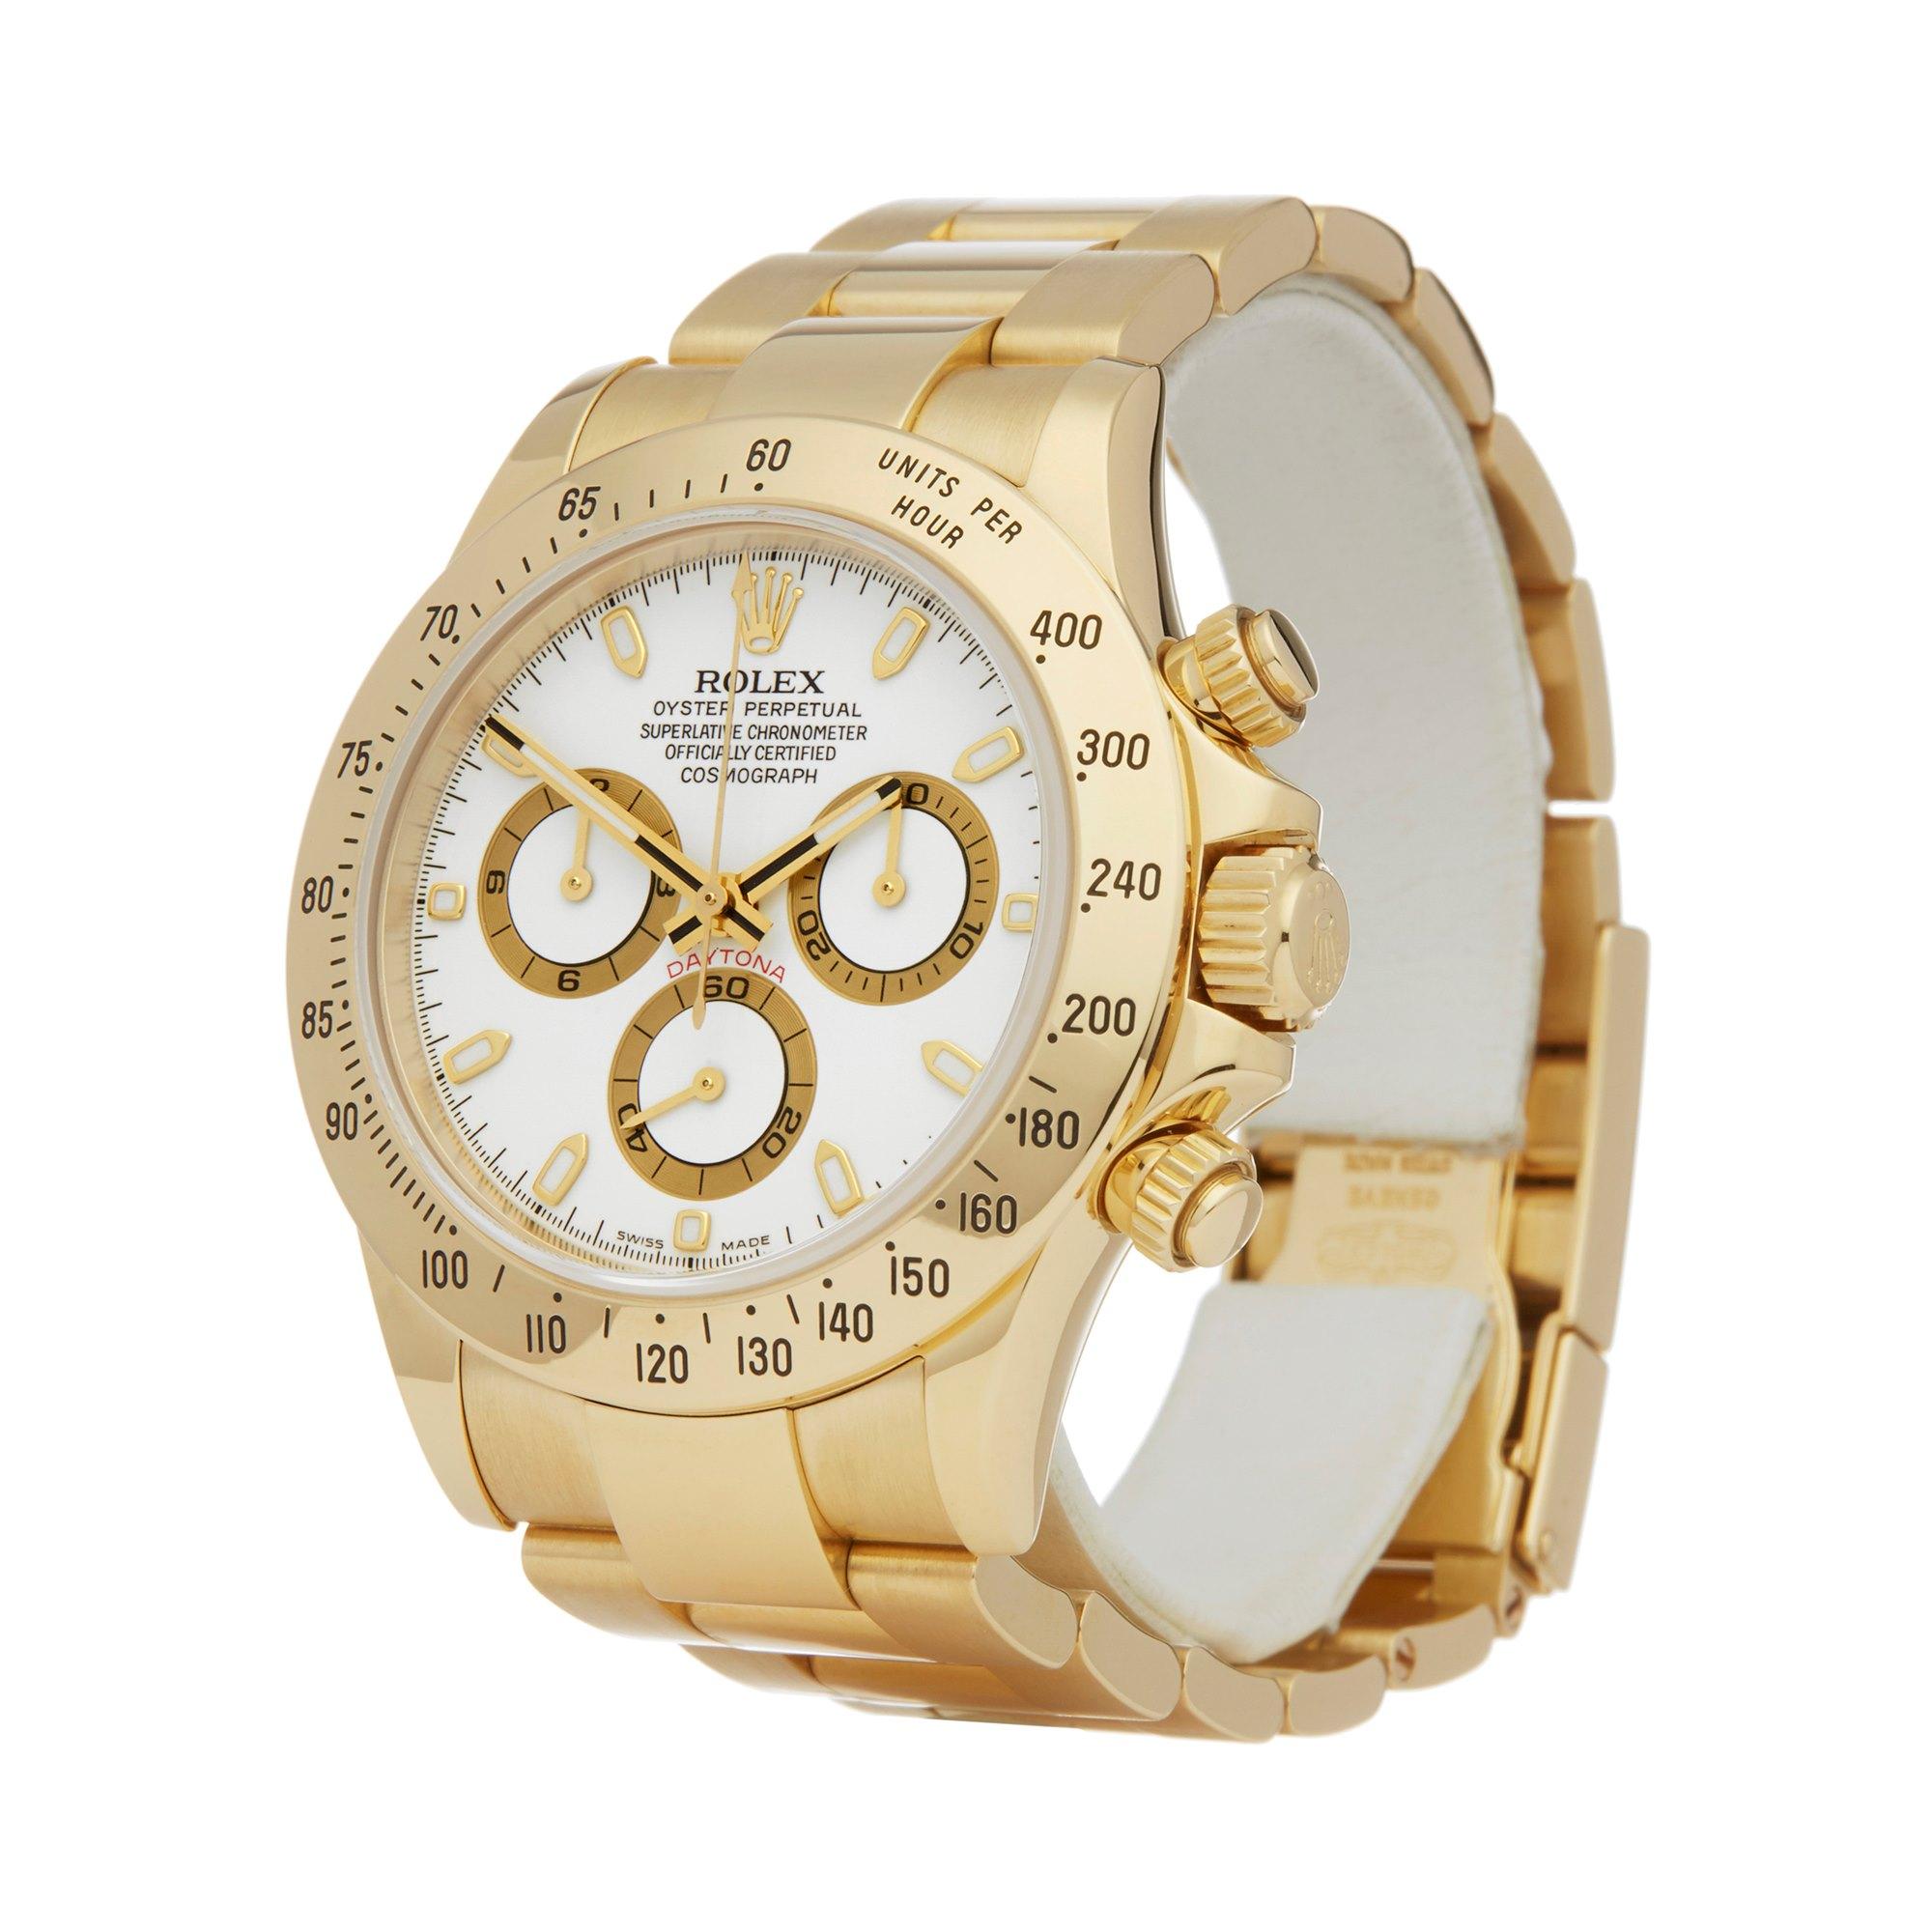 Rolex Daytona Chronograph NOS 18K Yellow Gold 116528